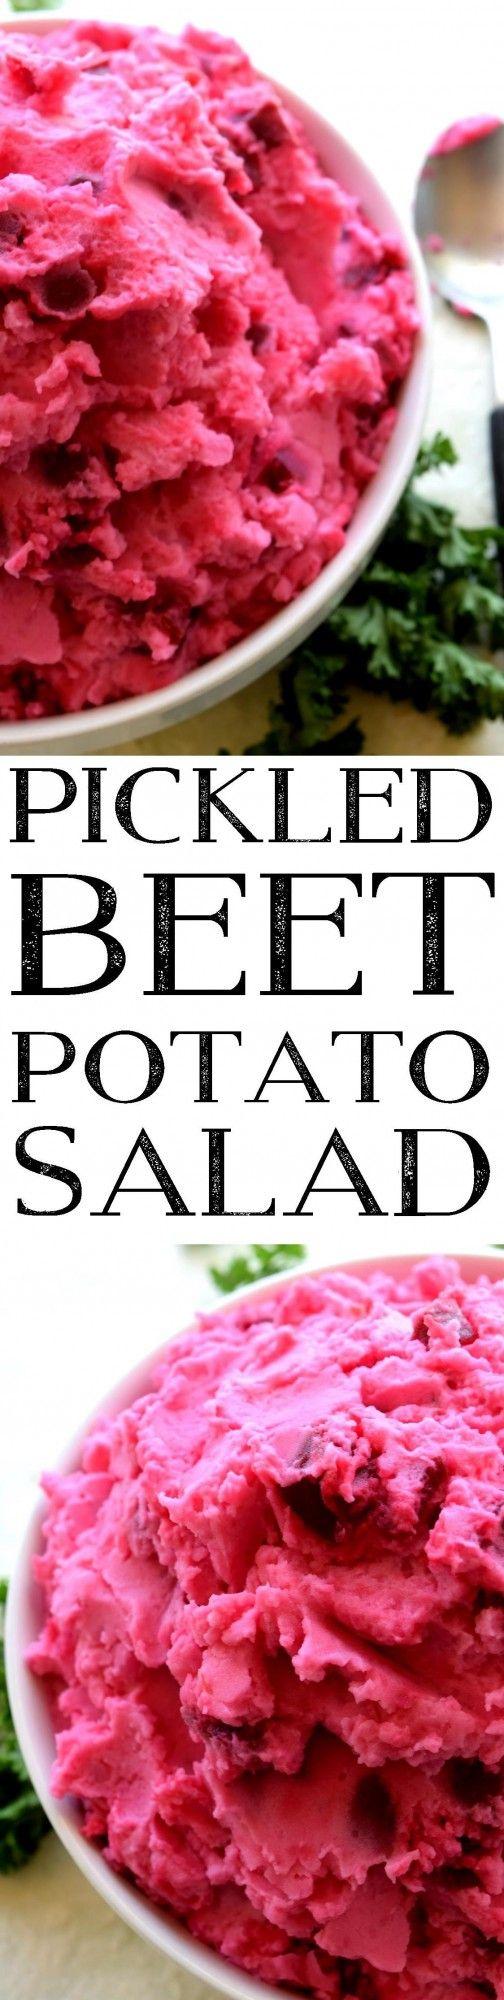 Pickled Beet Potato Salad - Lord Byron's Kitchen